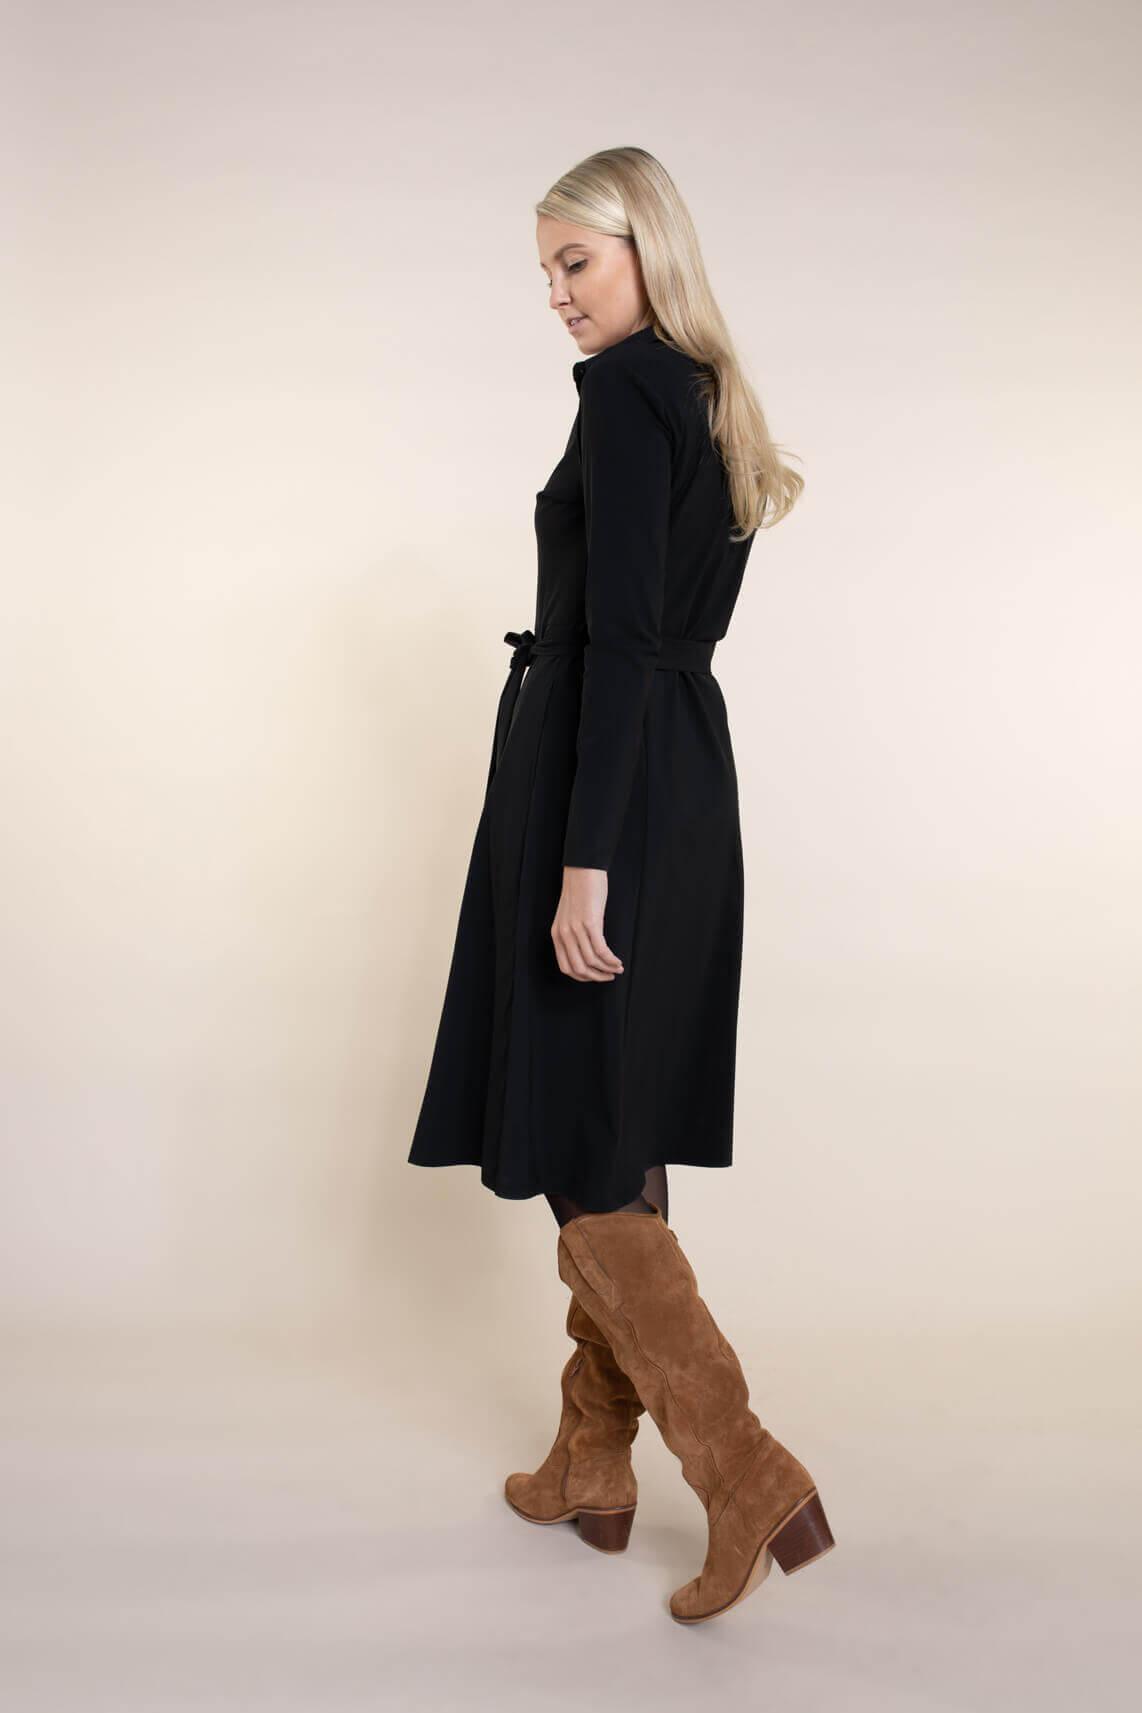 Jane Lushka Dames Barbara jurk zwart